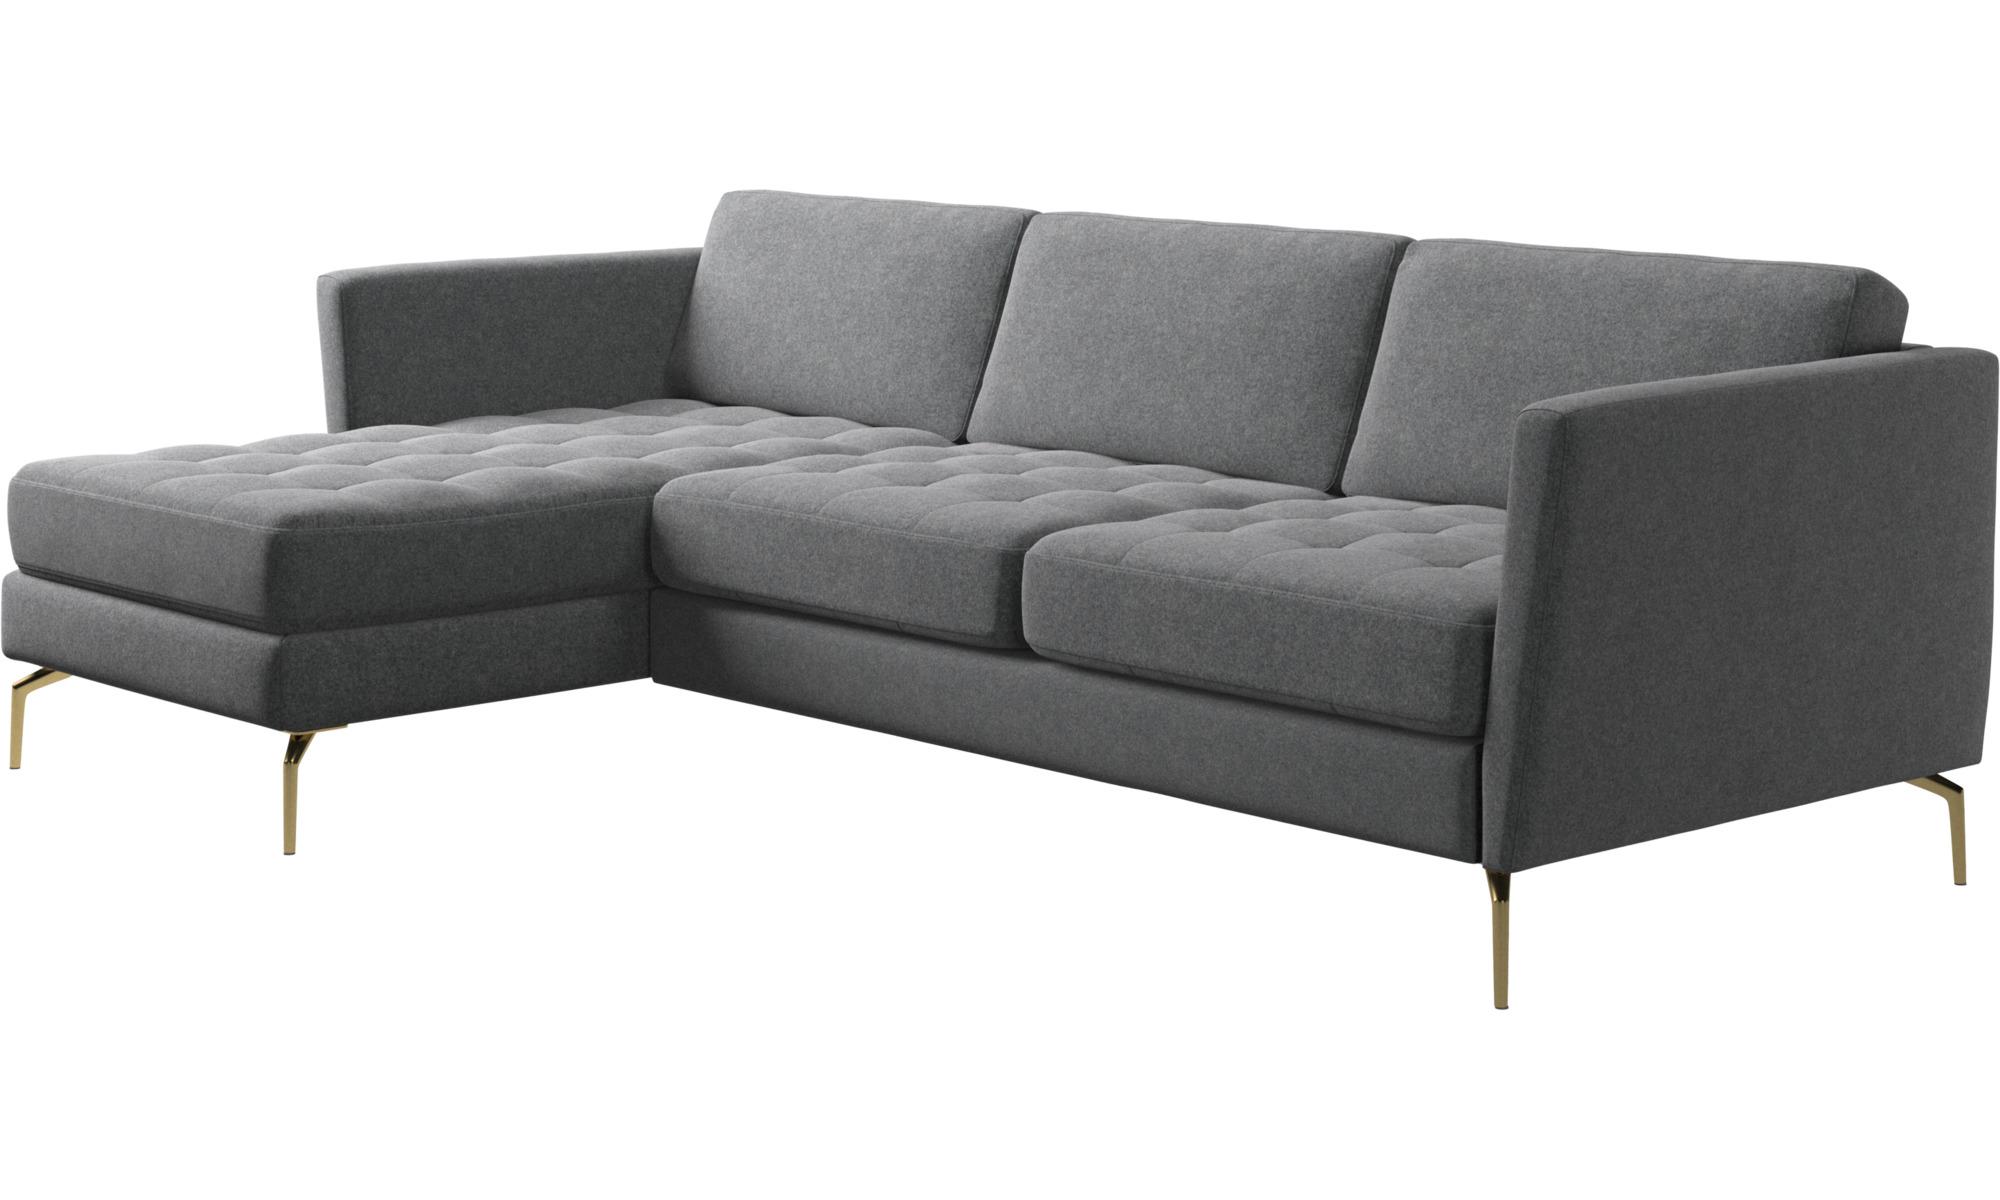 Chaise Lounge Sofas Osaka Sofa With